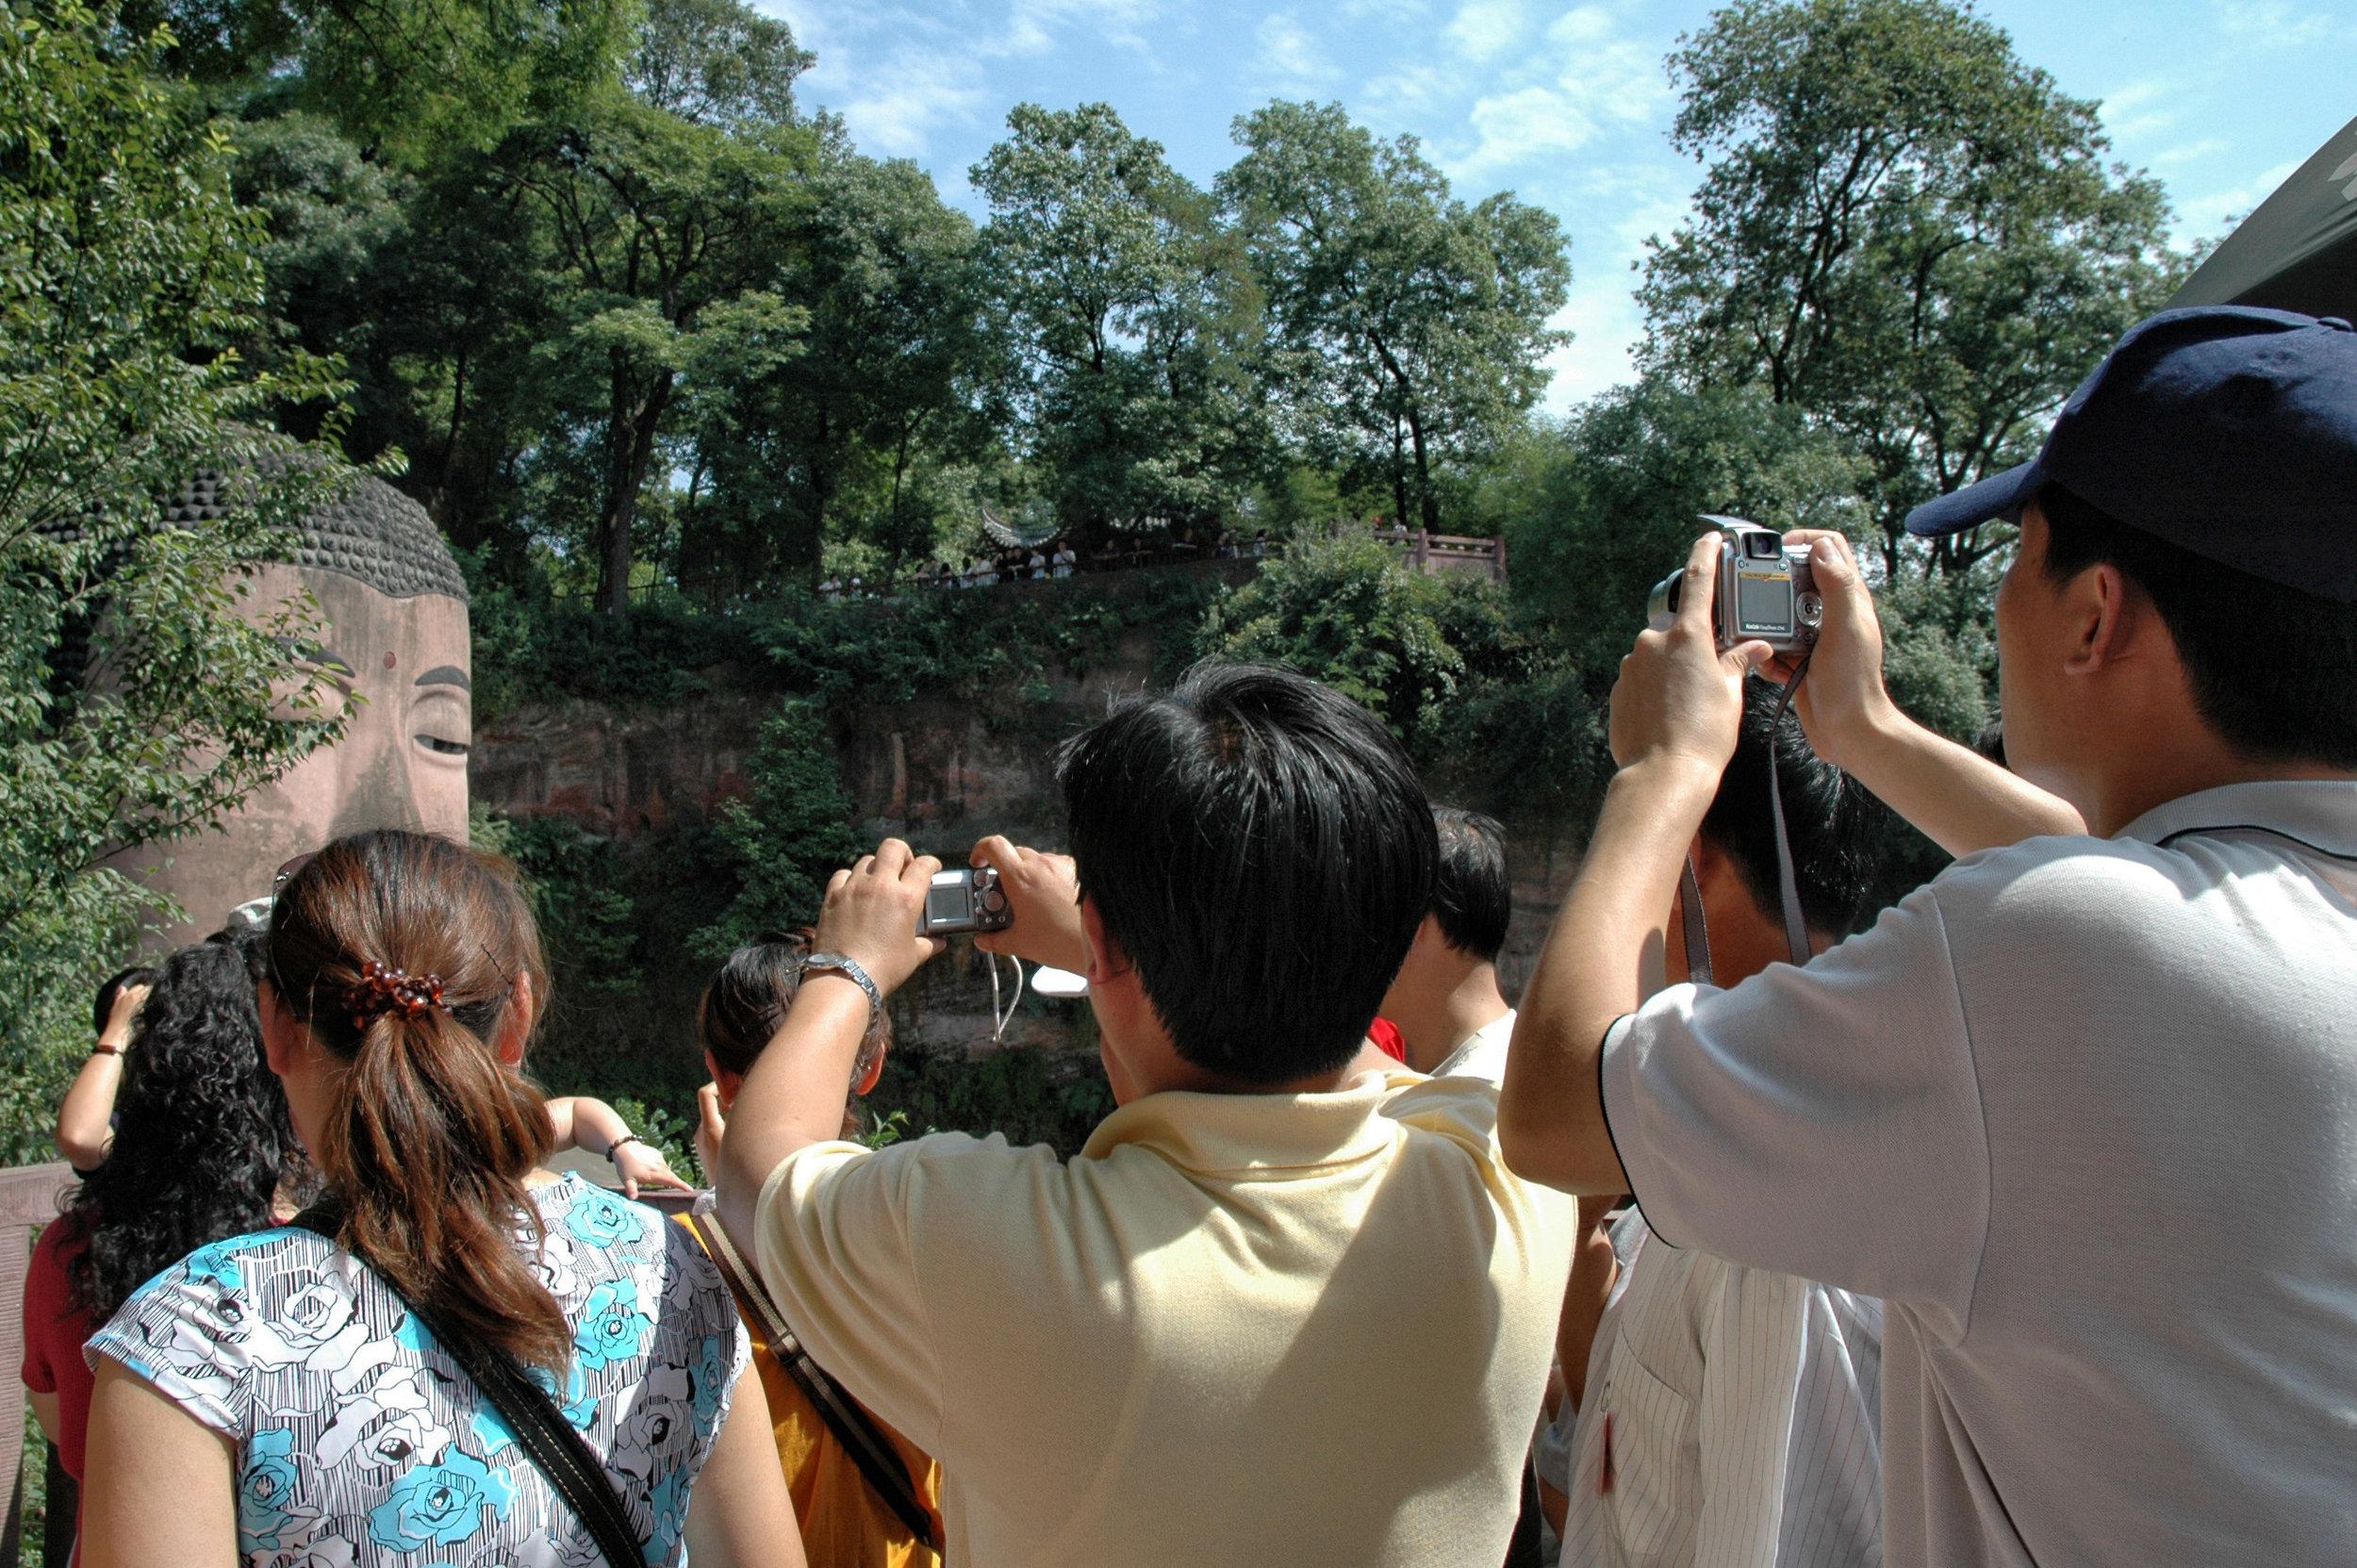 peoplephotographing27.jpg